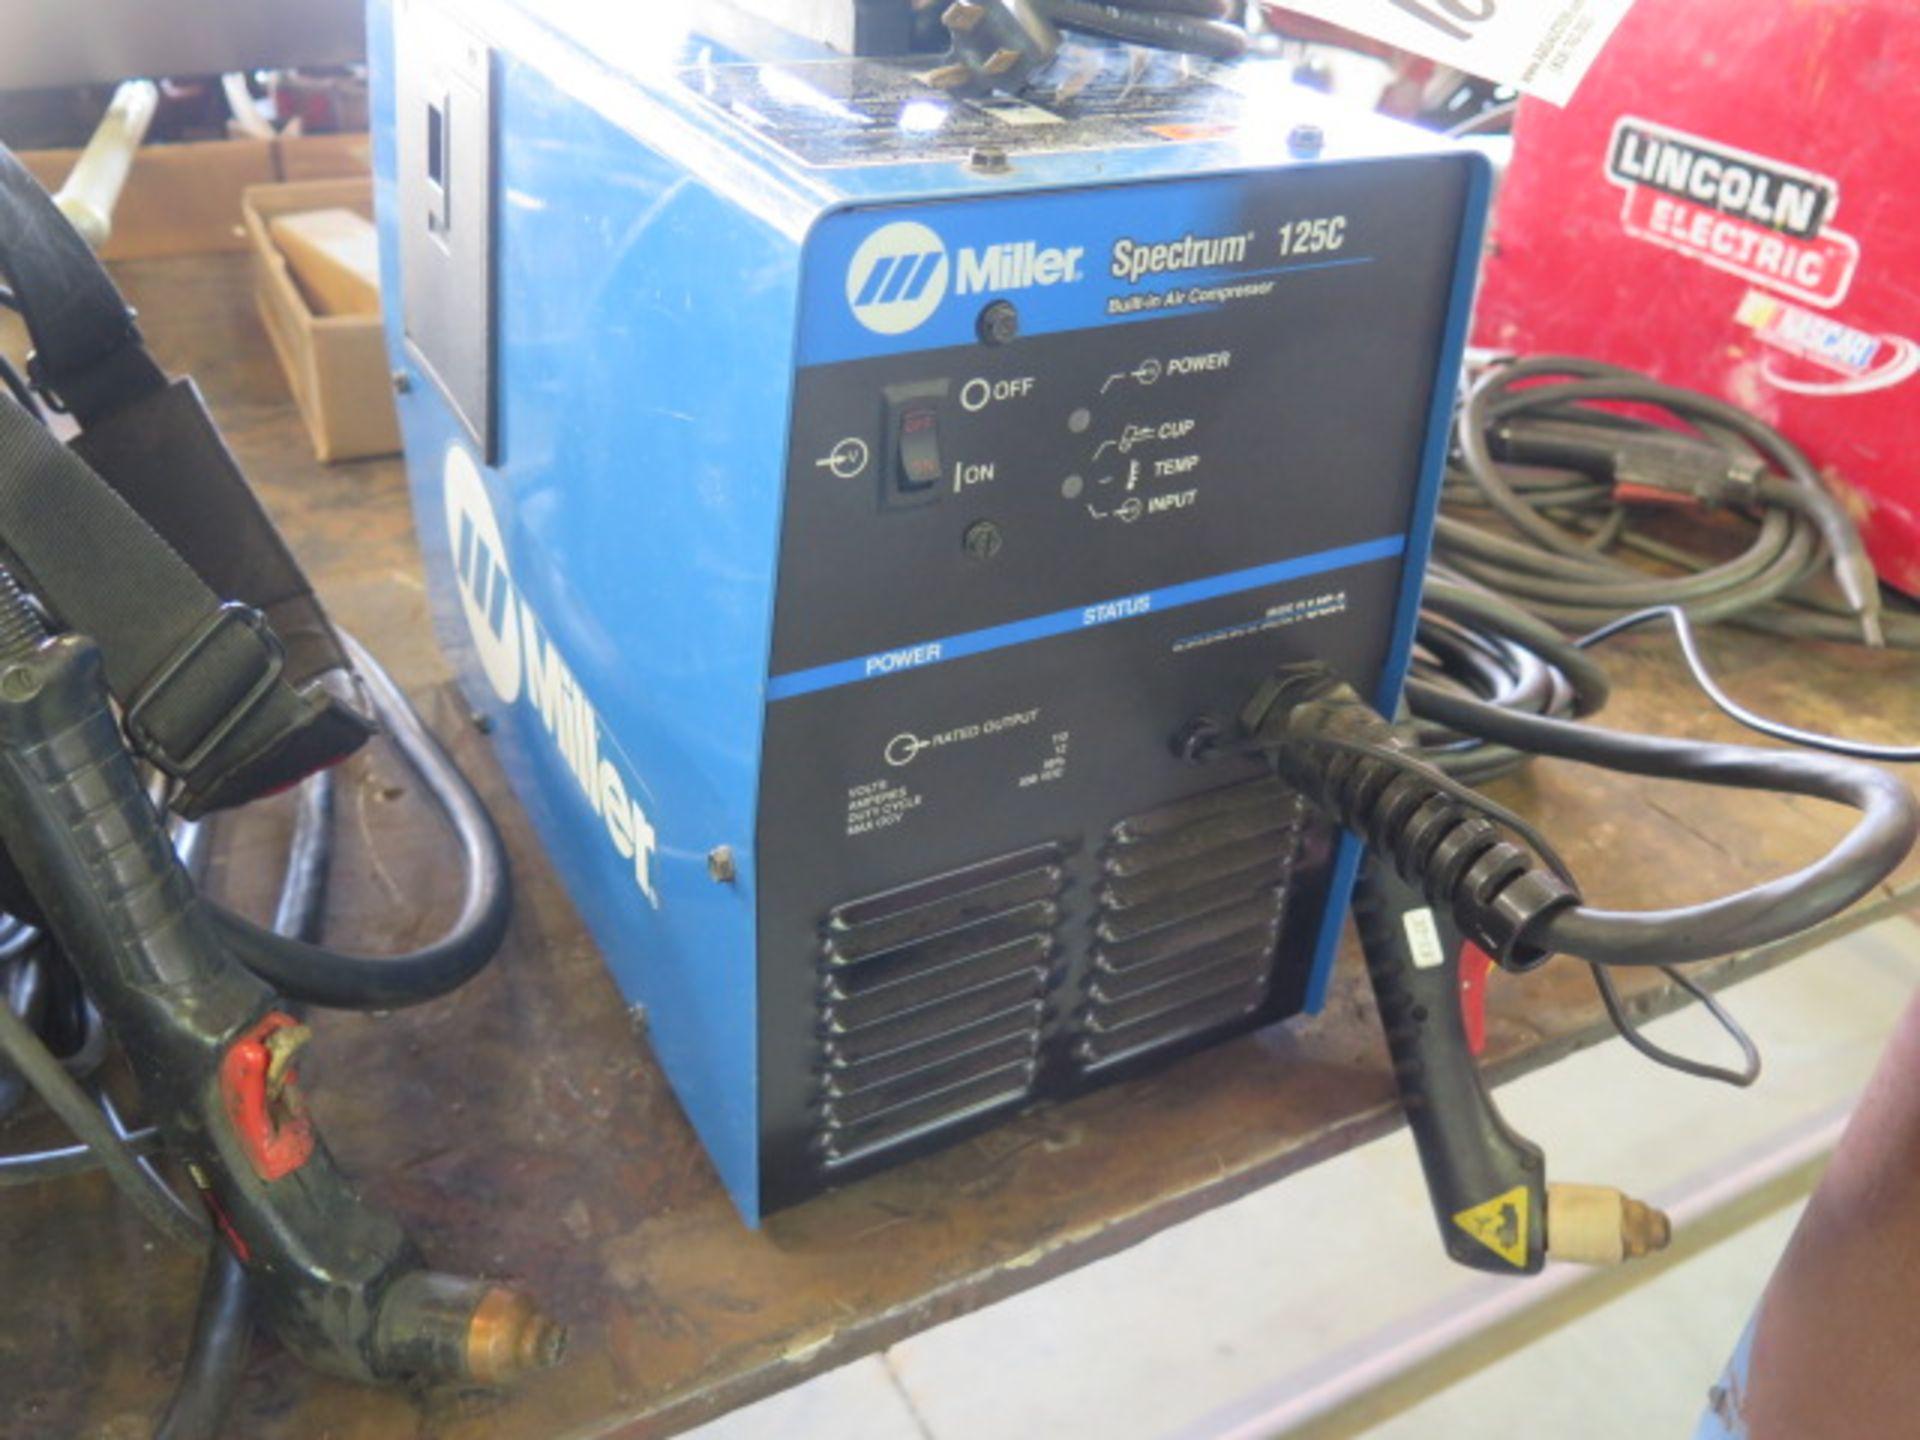 Lot 18 - Miller Spectrum 125C Plasma Cutting Power Source s/n LJ270052D w/ Built-In Compressor